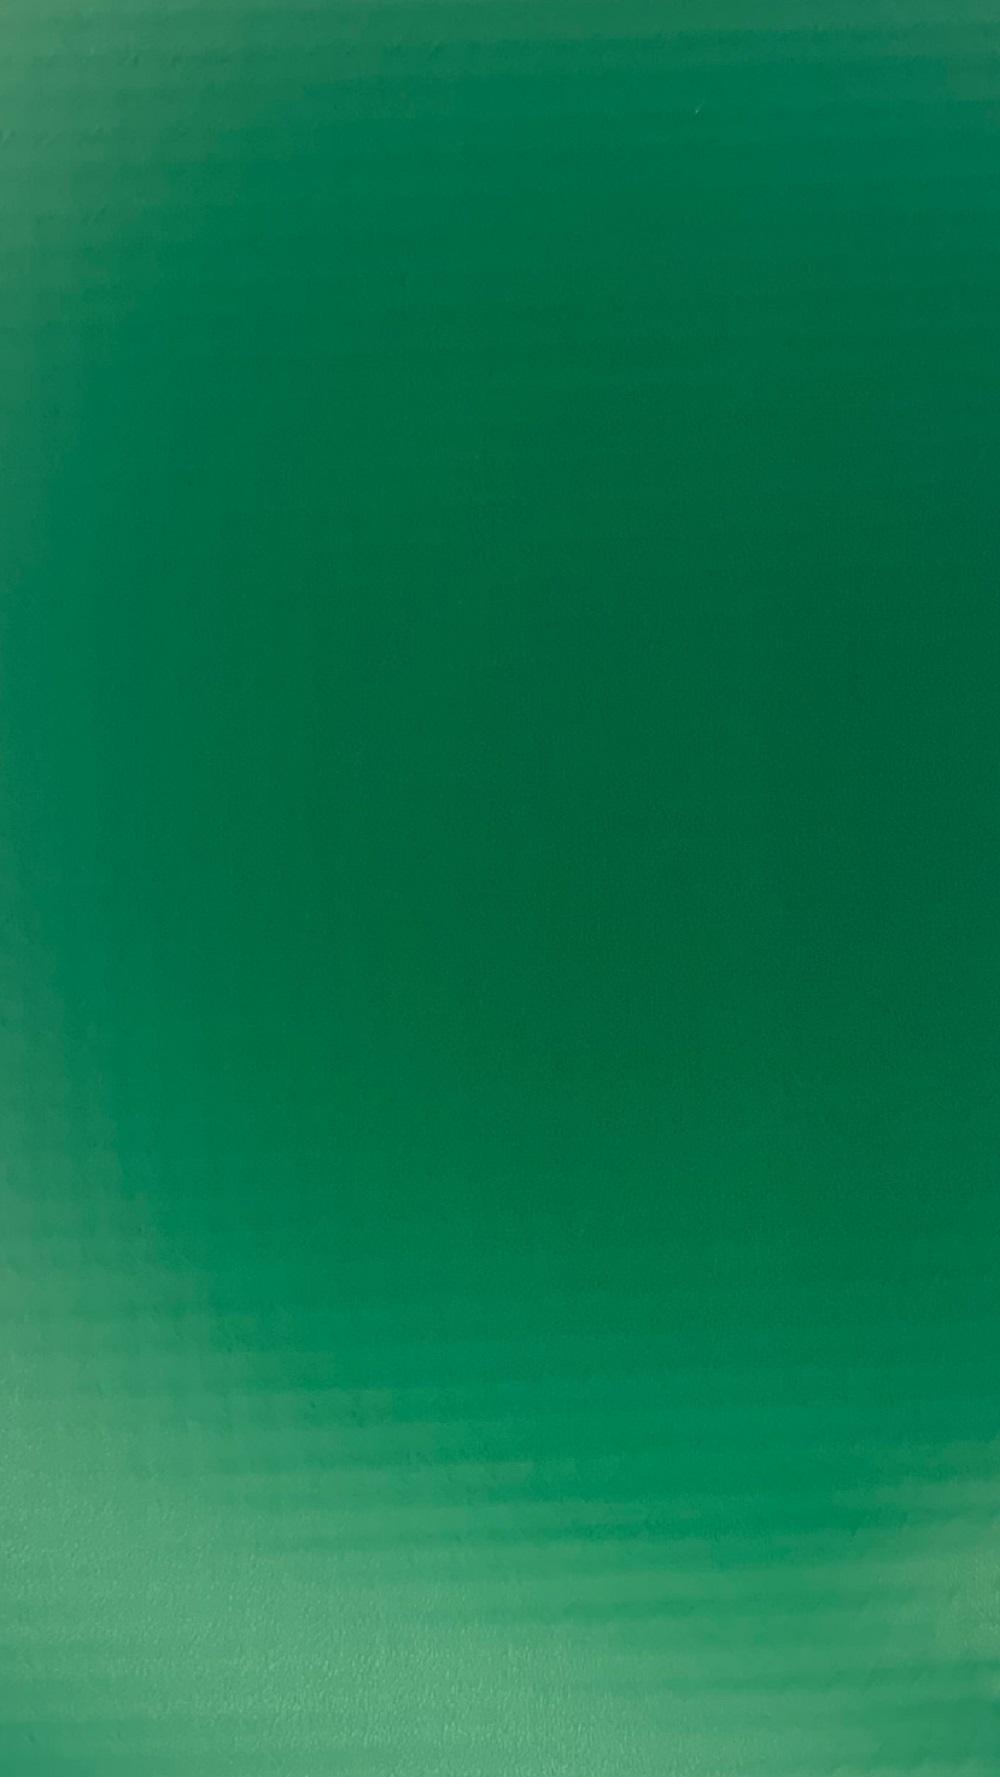 Lona Vinilona Df Fosca Verde S-485 1,45mt X 50,0mts